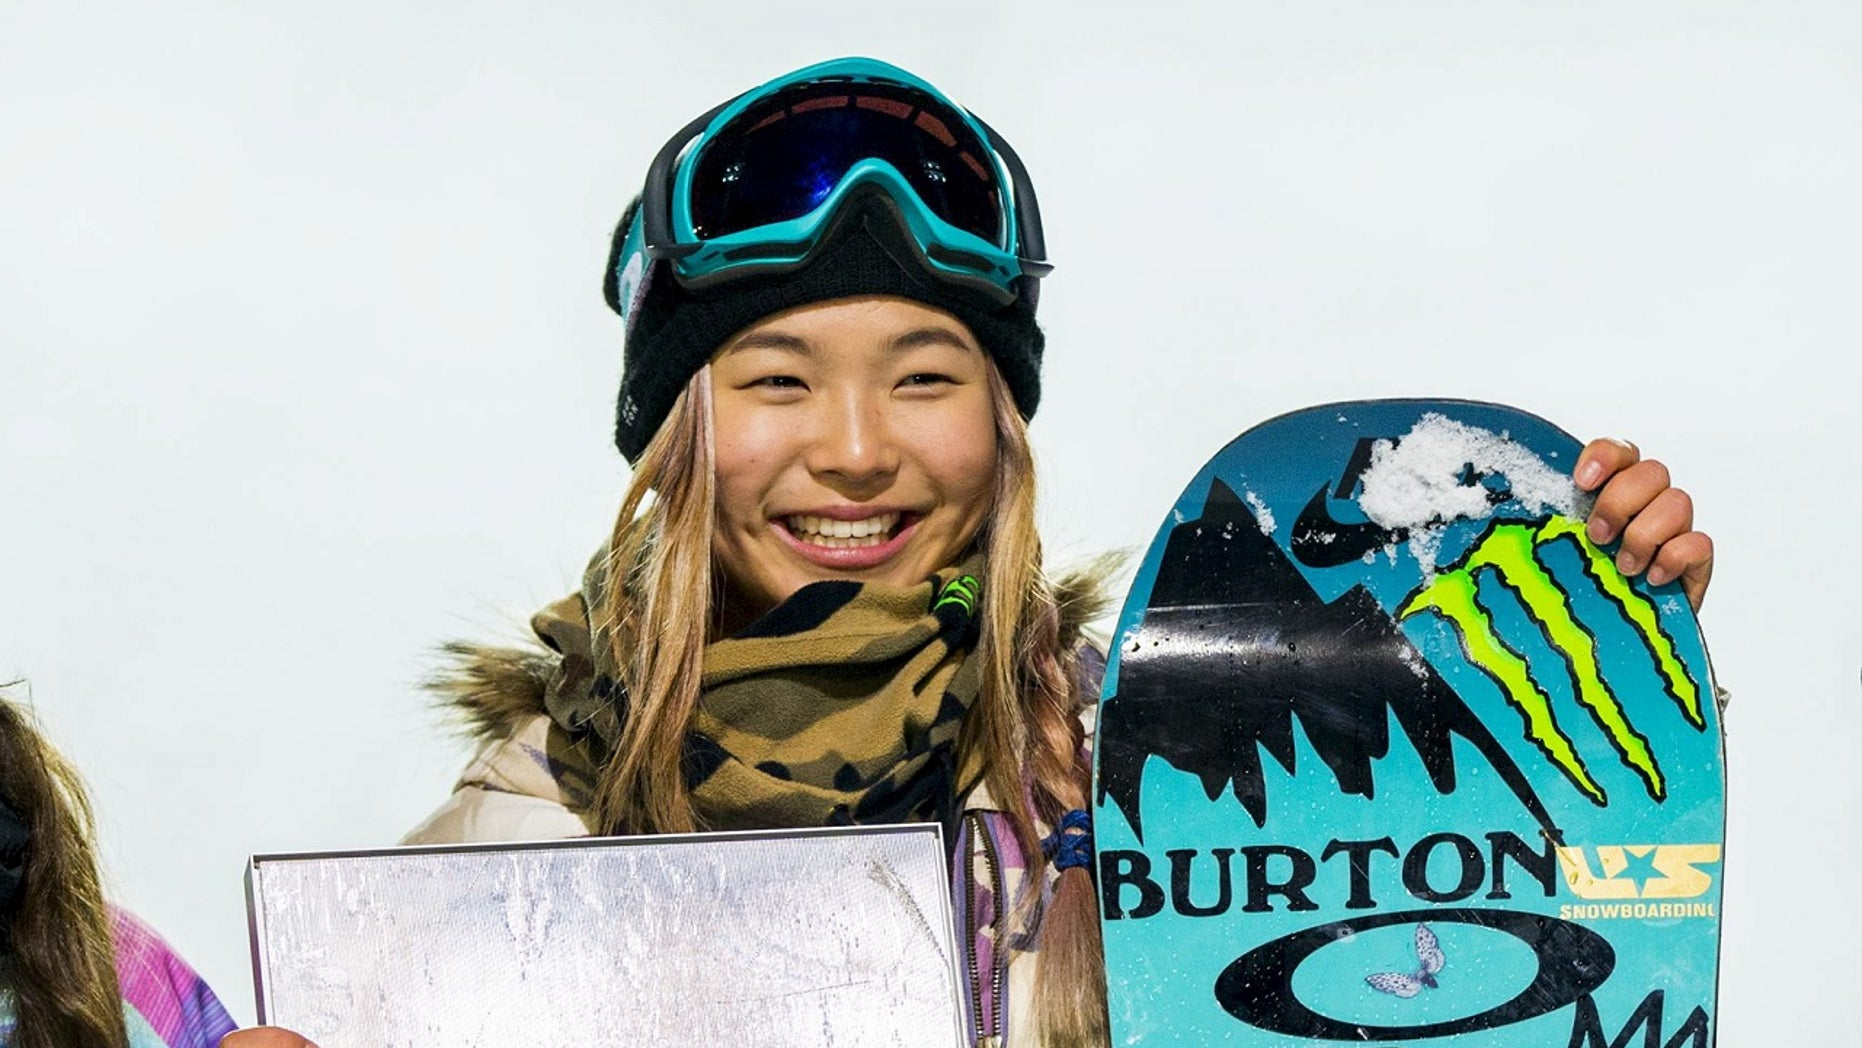 U.S. Olympic snowboarder Chloe Kim, of Torrance, Calif., is seen at the X Games in Oslo, Feb. 26, 2016.